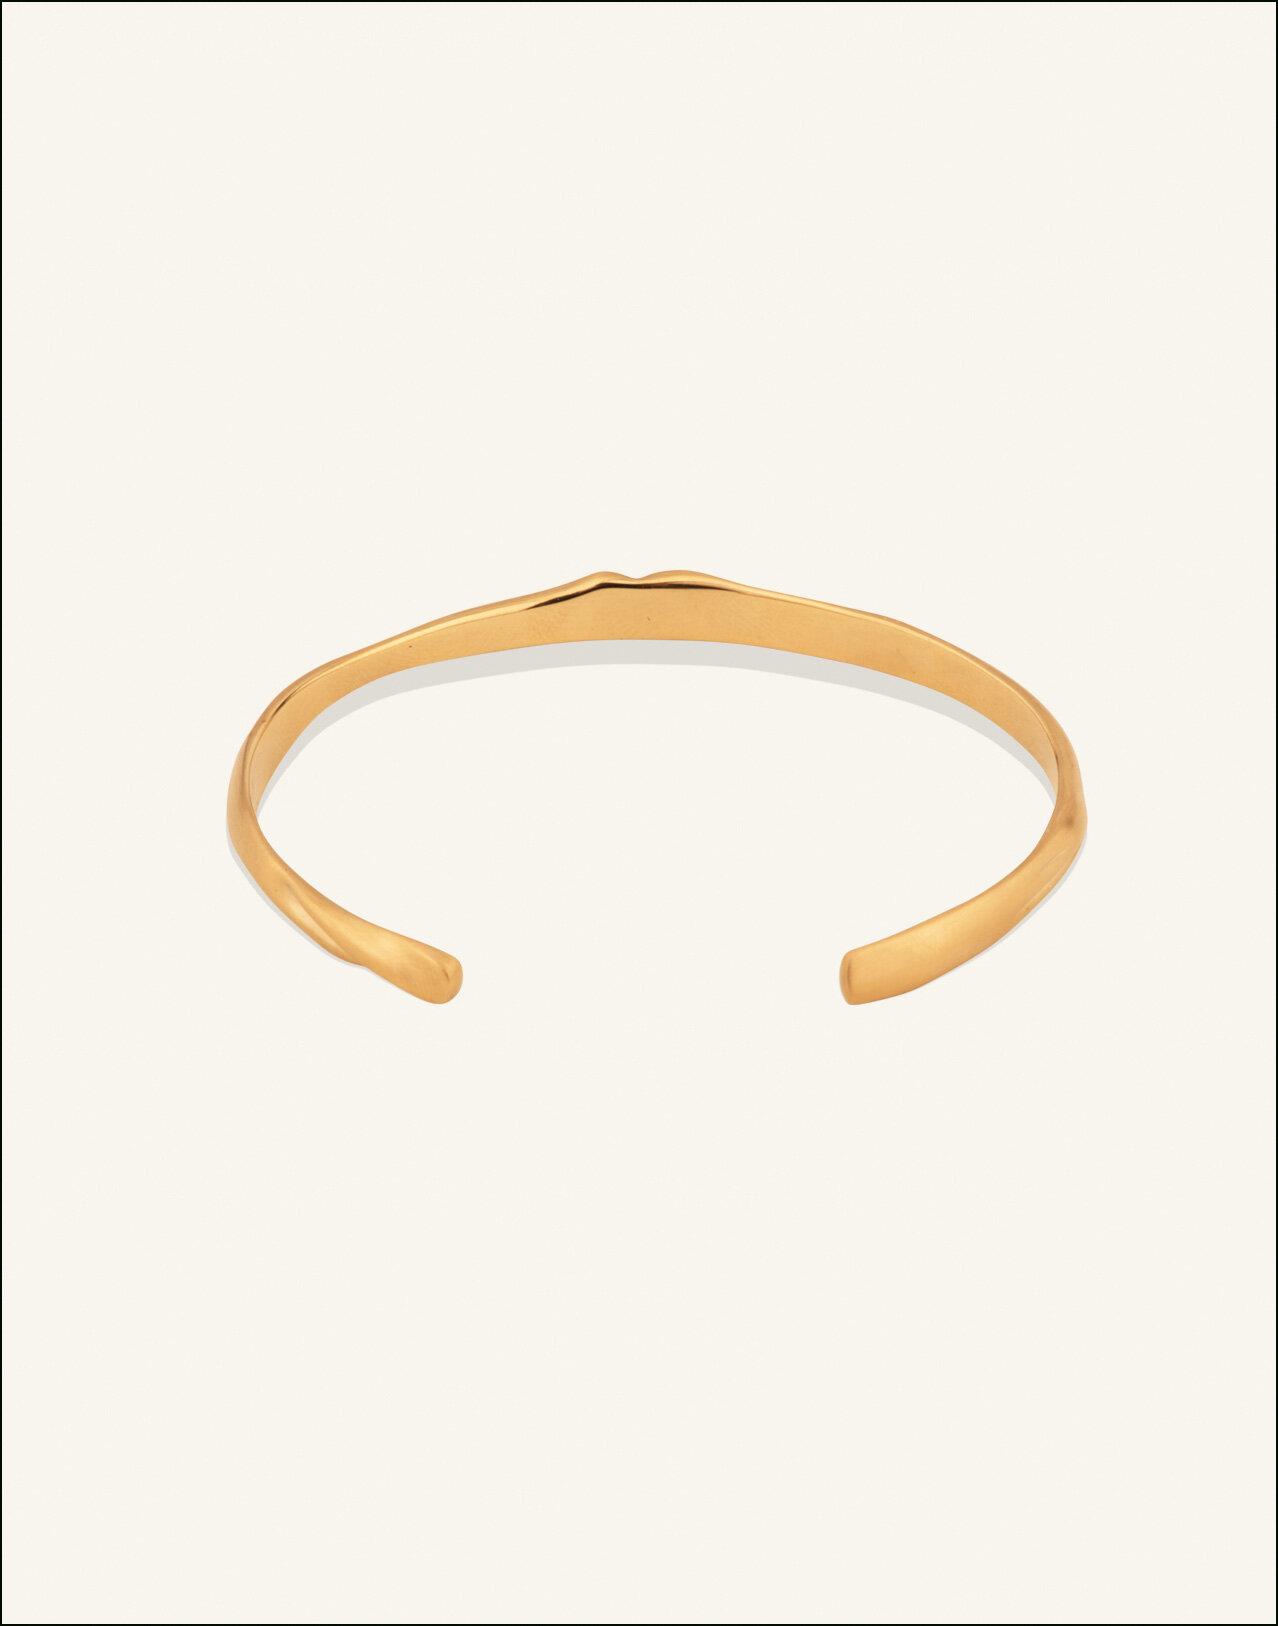 Completedworks-Gold-Vermeil-Cuff-Unconscious-Landscapes-3.jpg